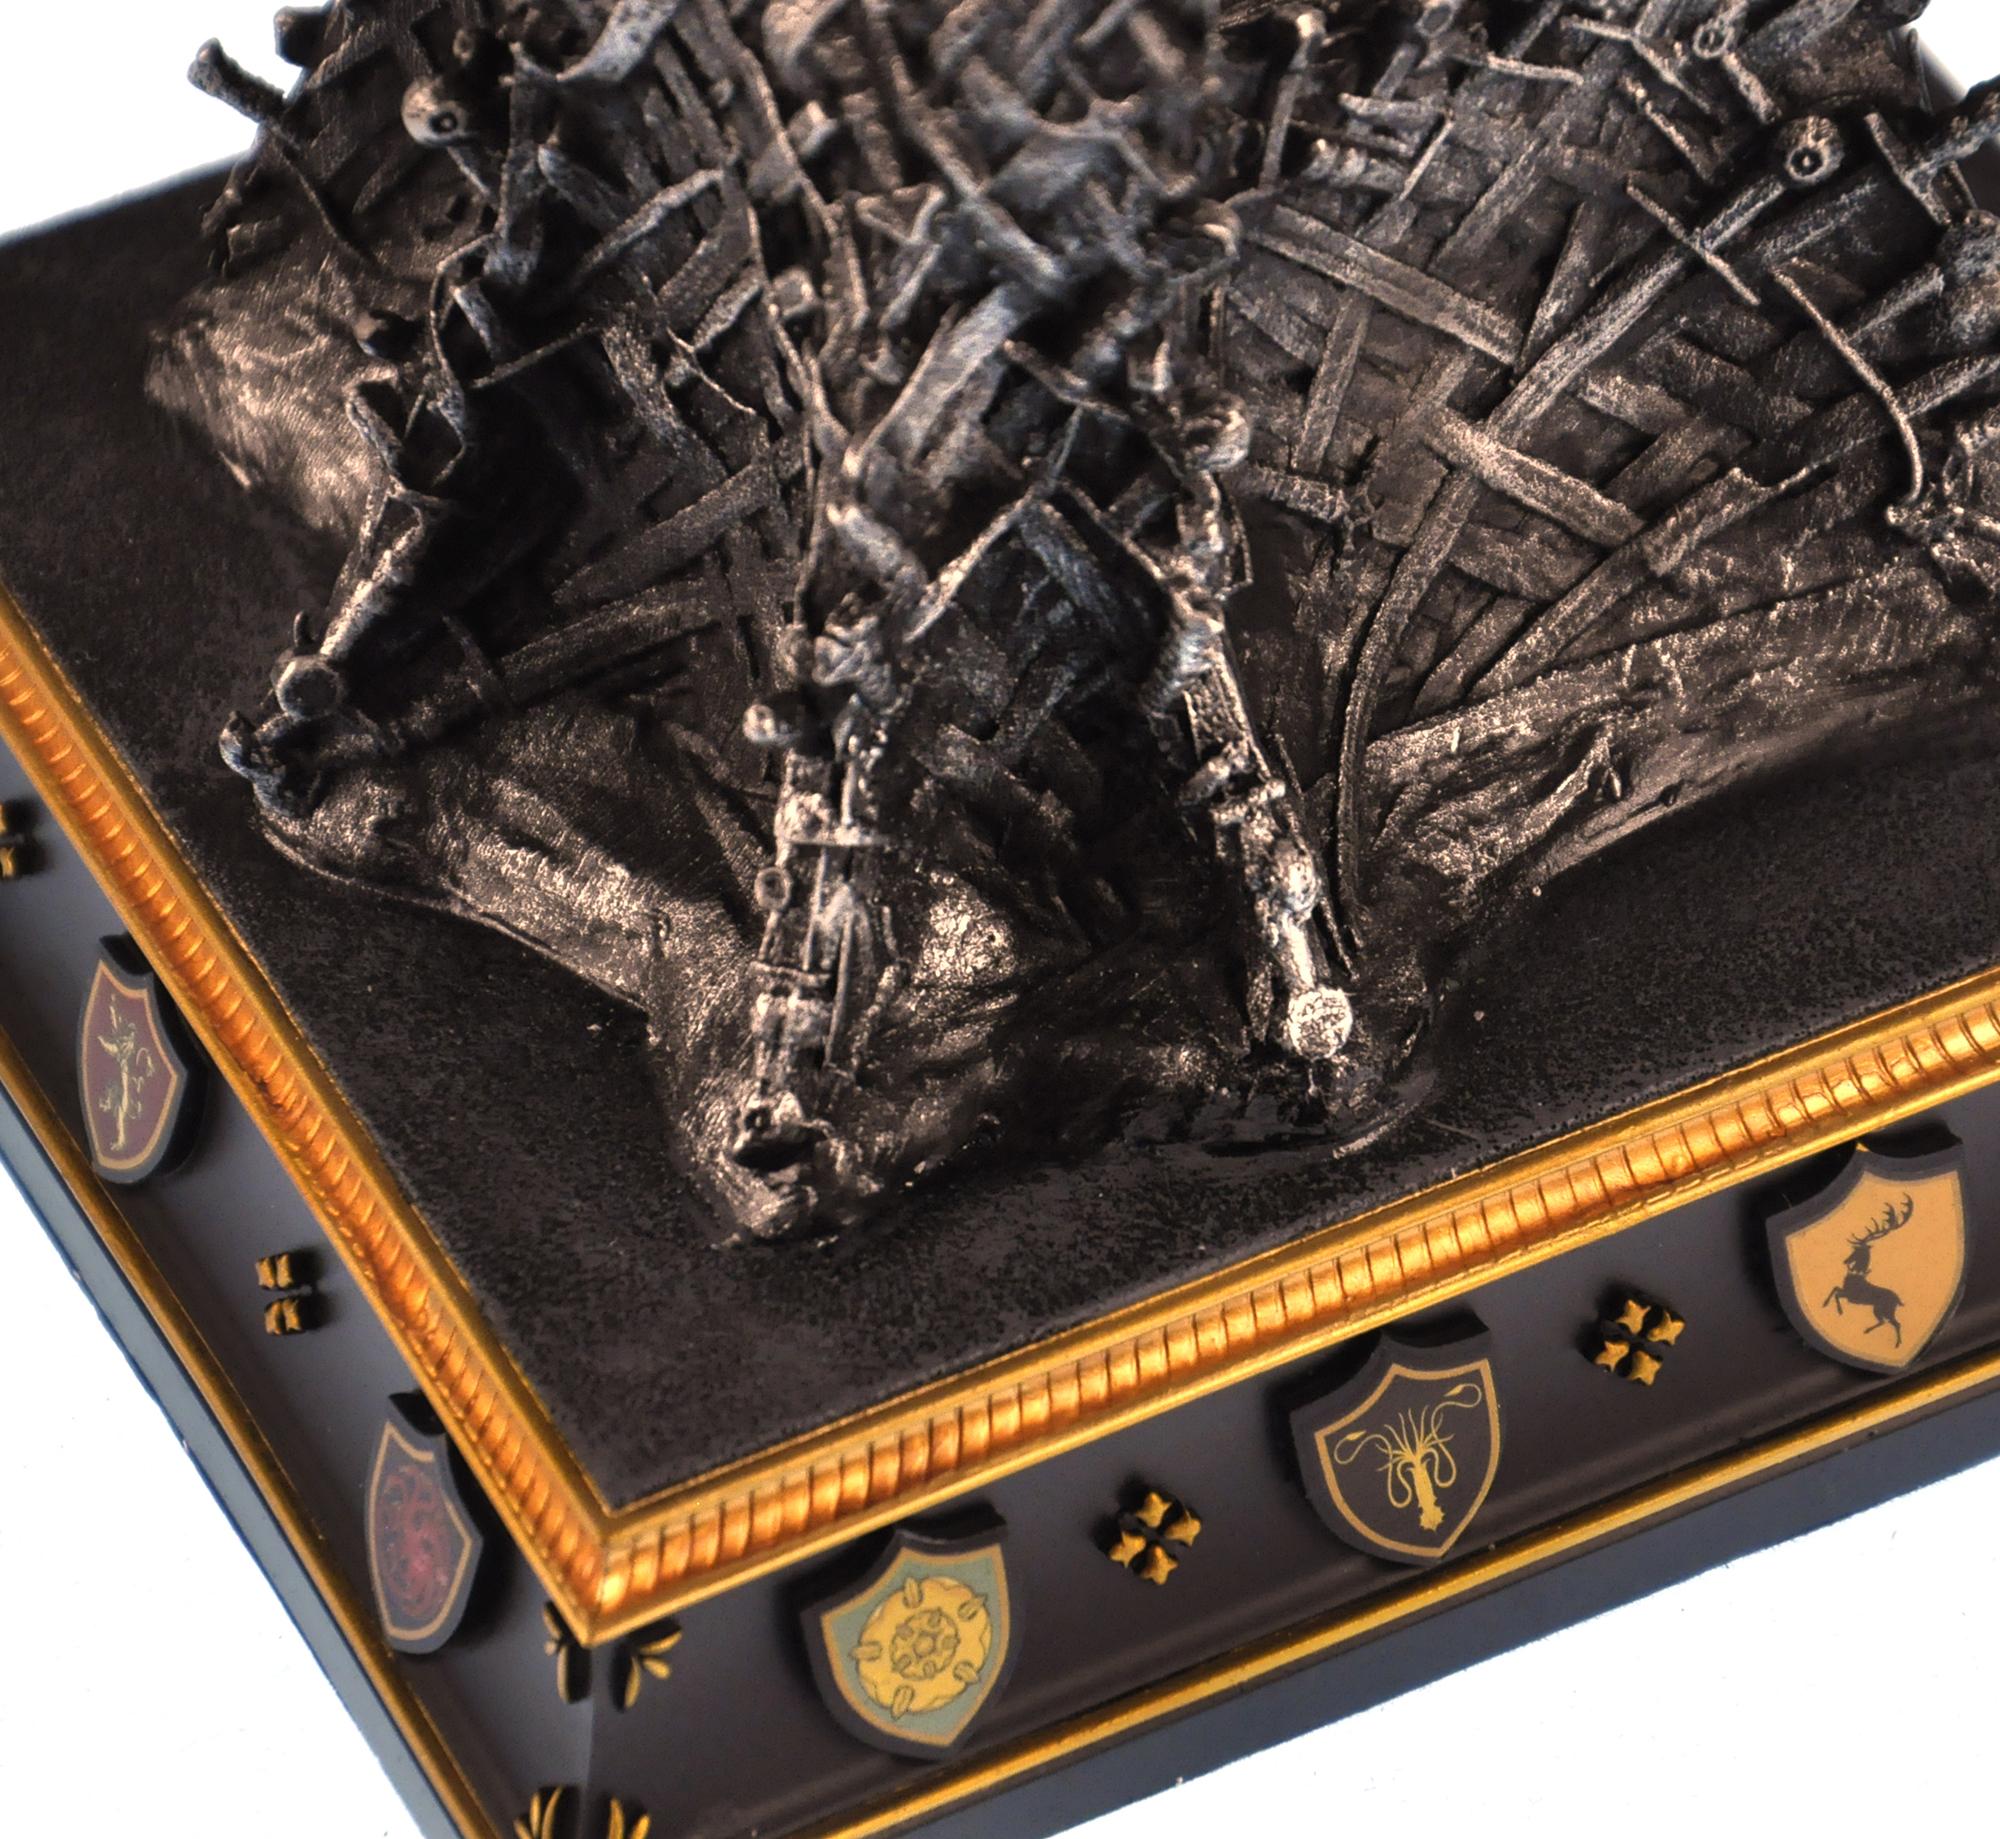 THE Iron Throne THE Game OF Thrones Replica eBay